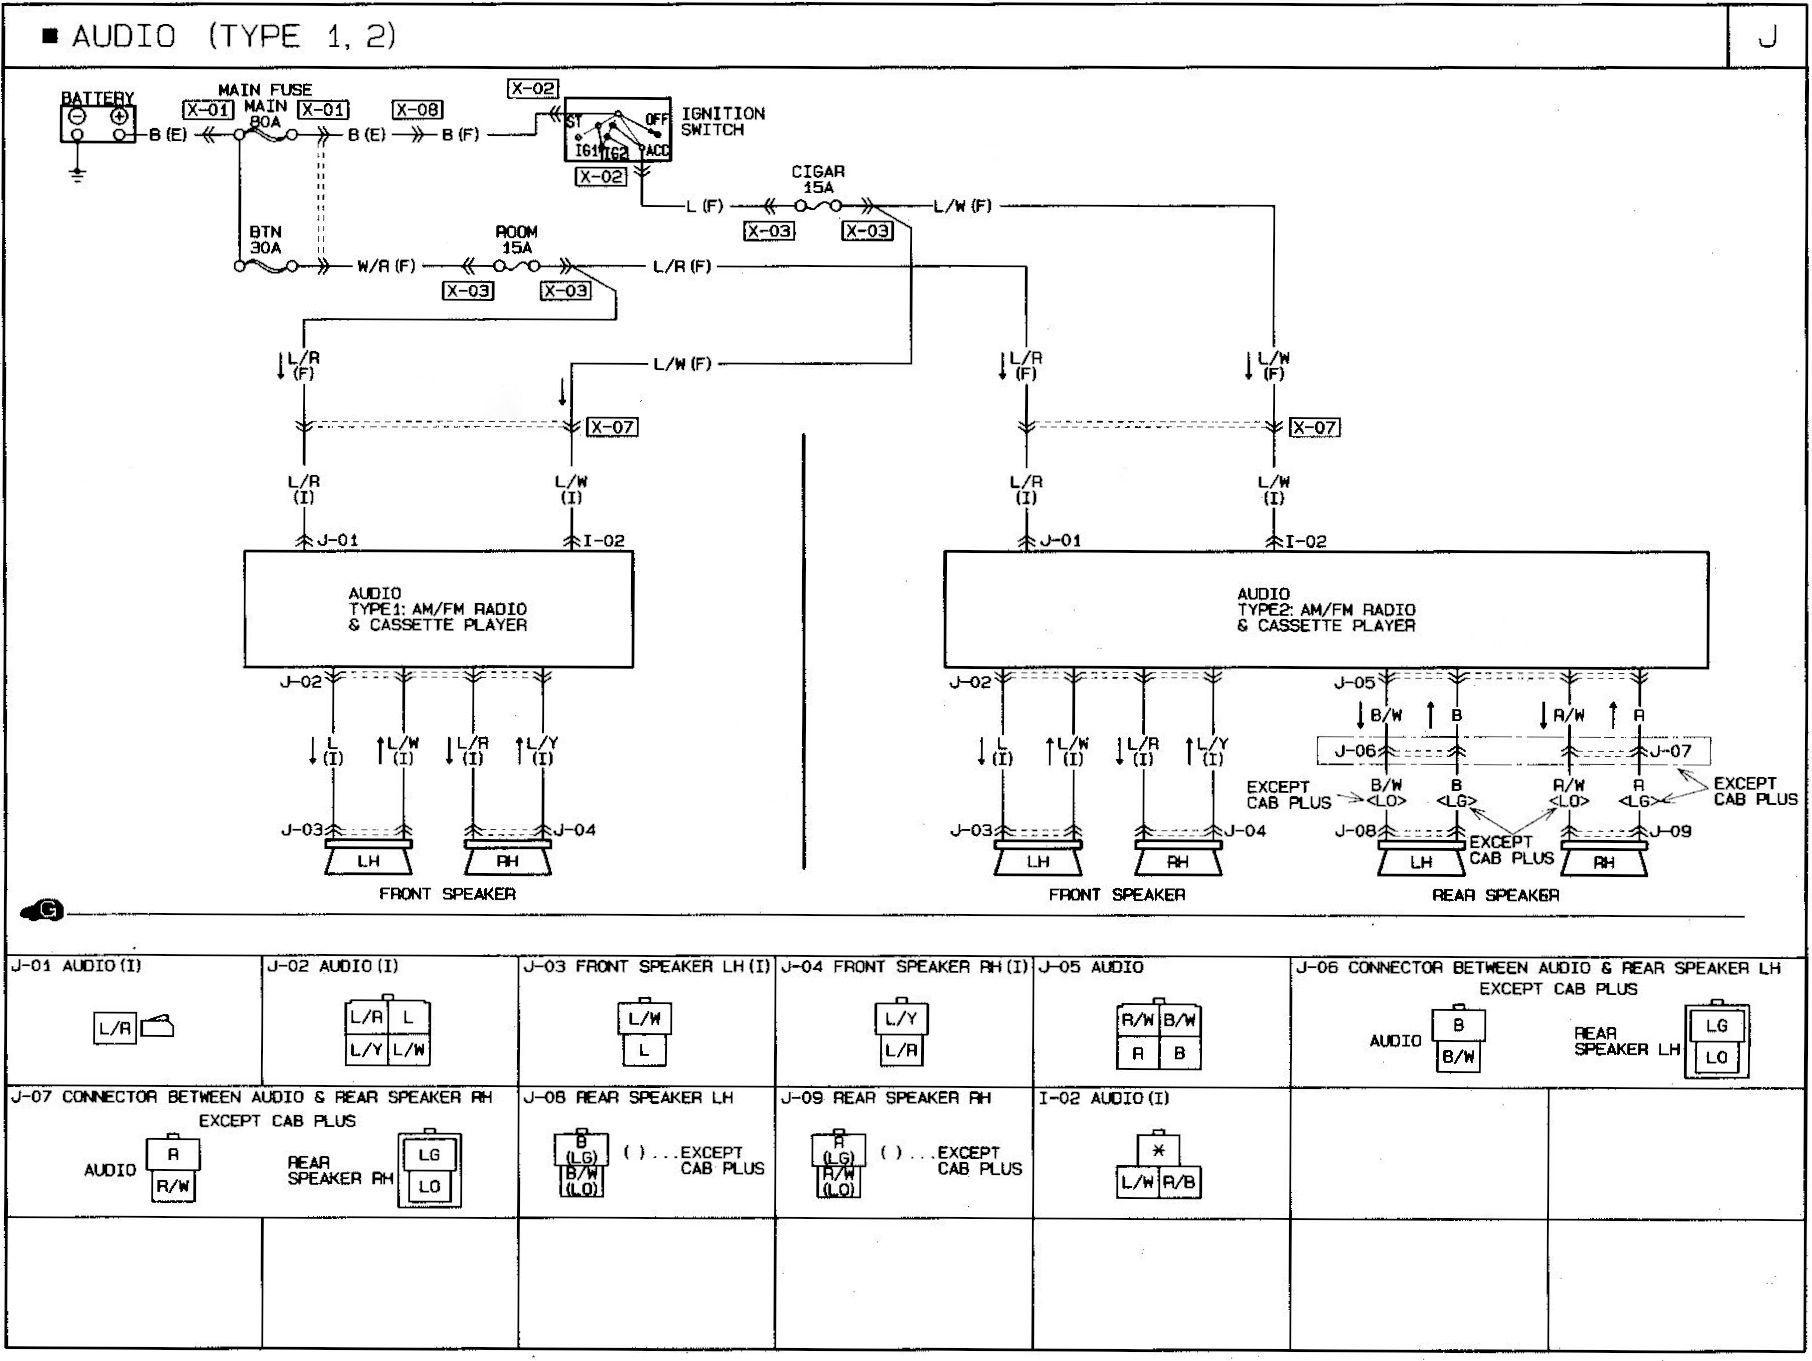 1988 mazda b2600 wiring diagram | wiring diagram multiple relate  boa gialla